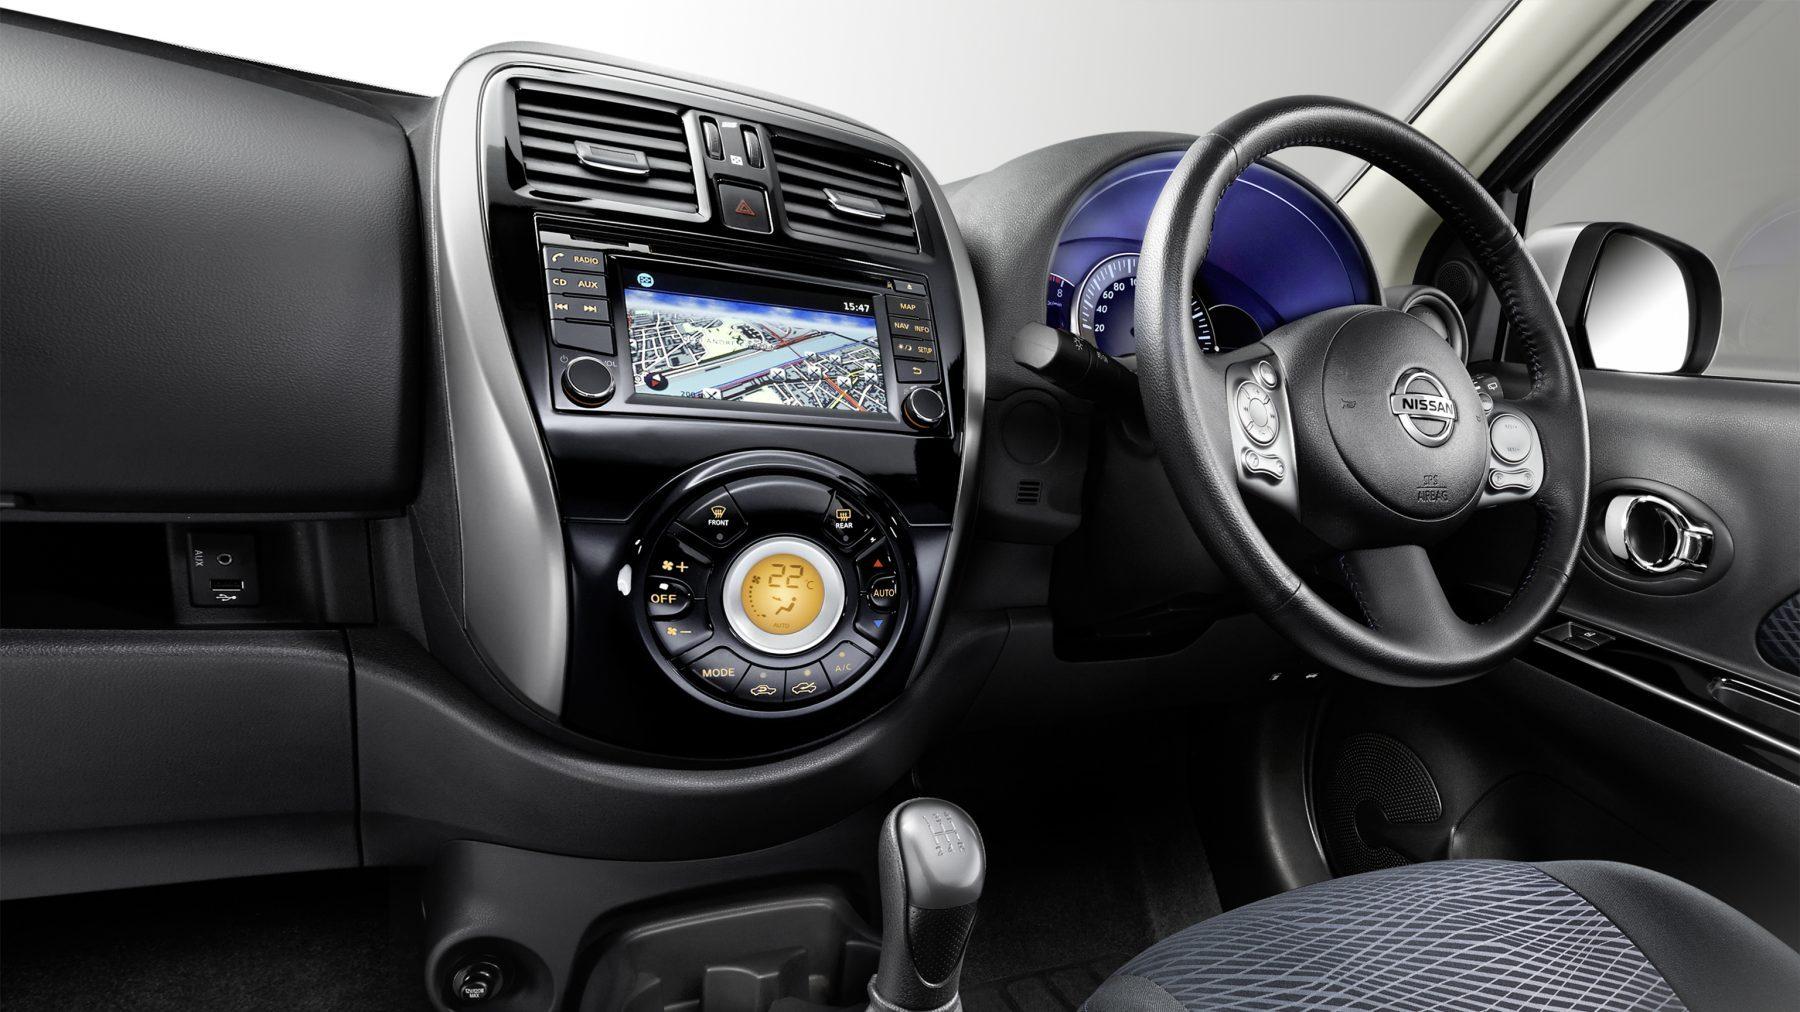 Nissan Micra - NissanConnect system